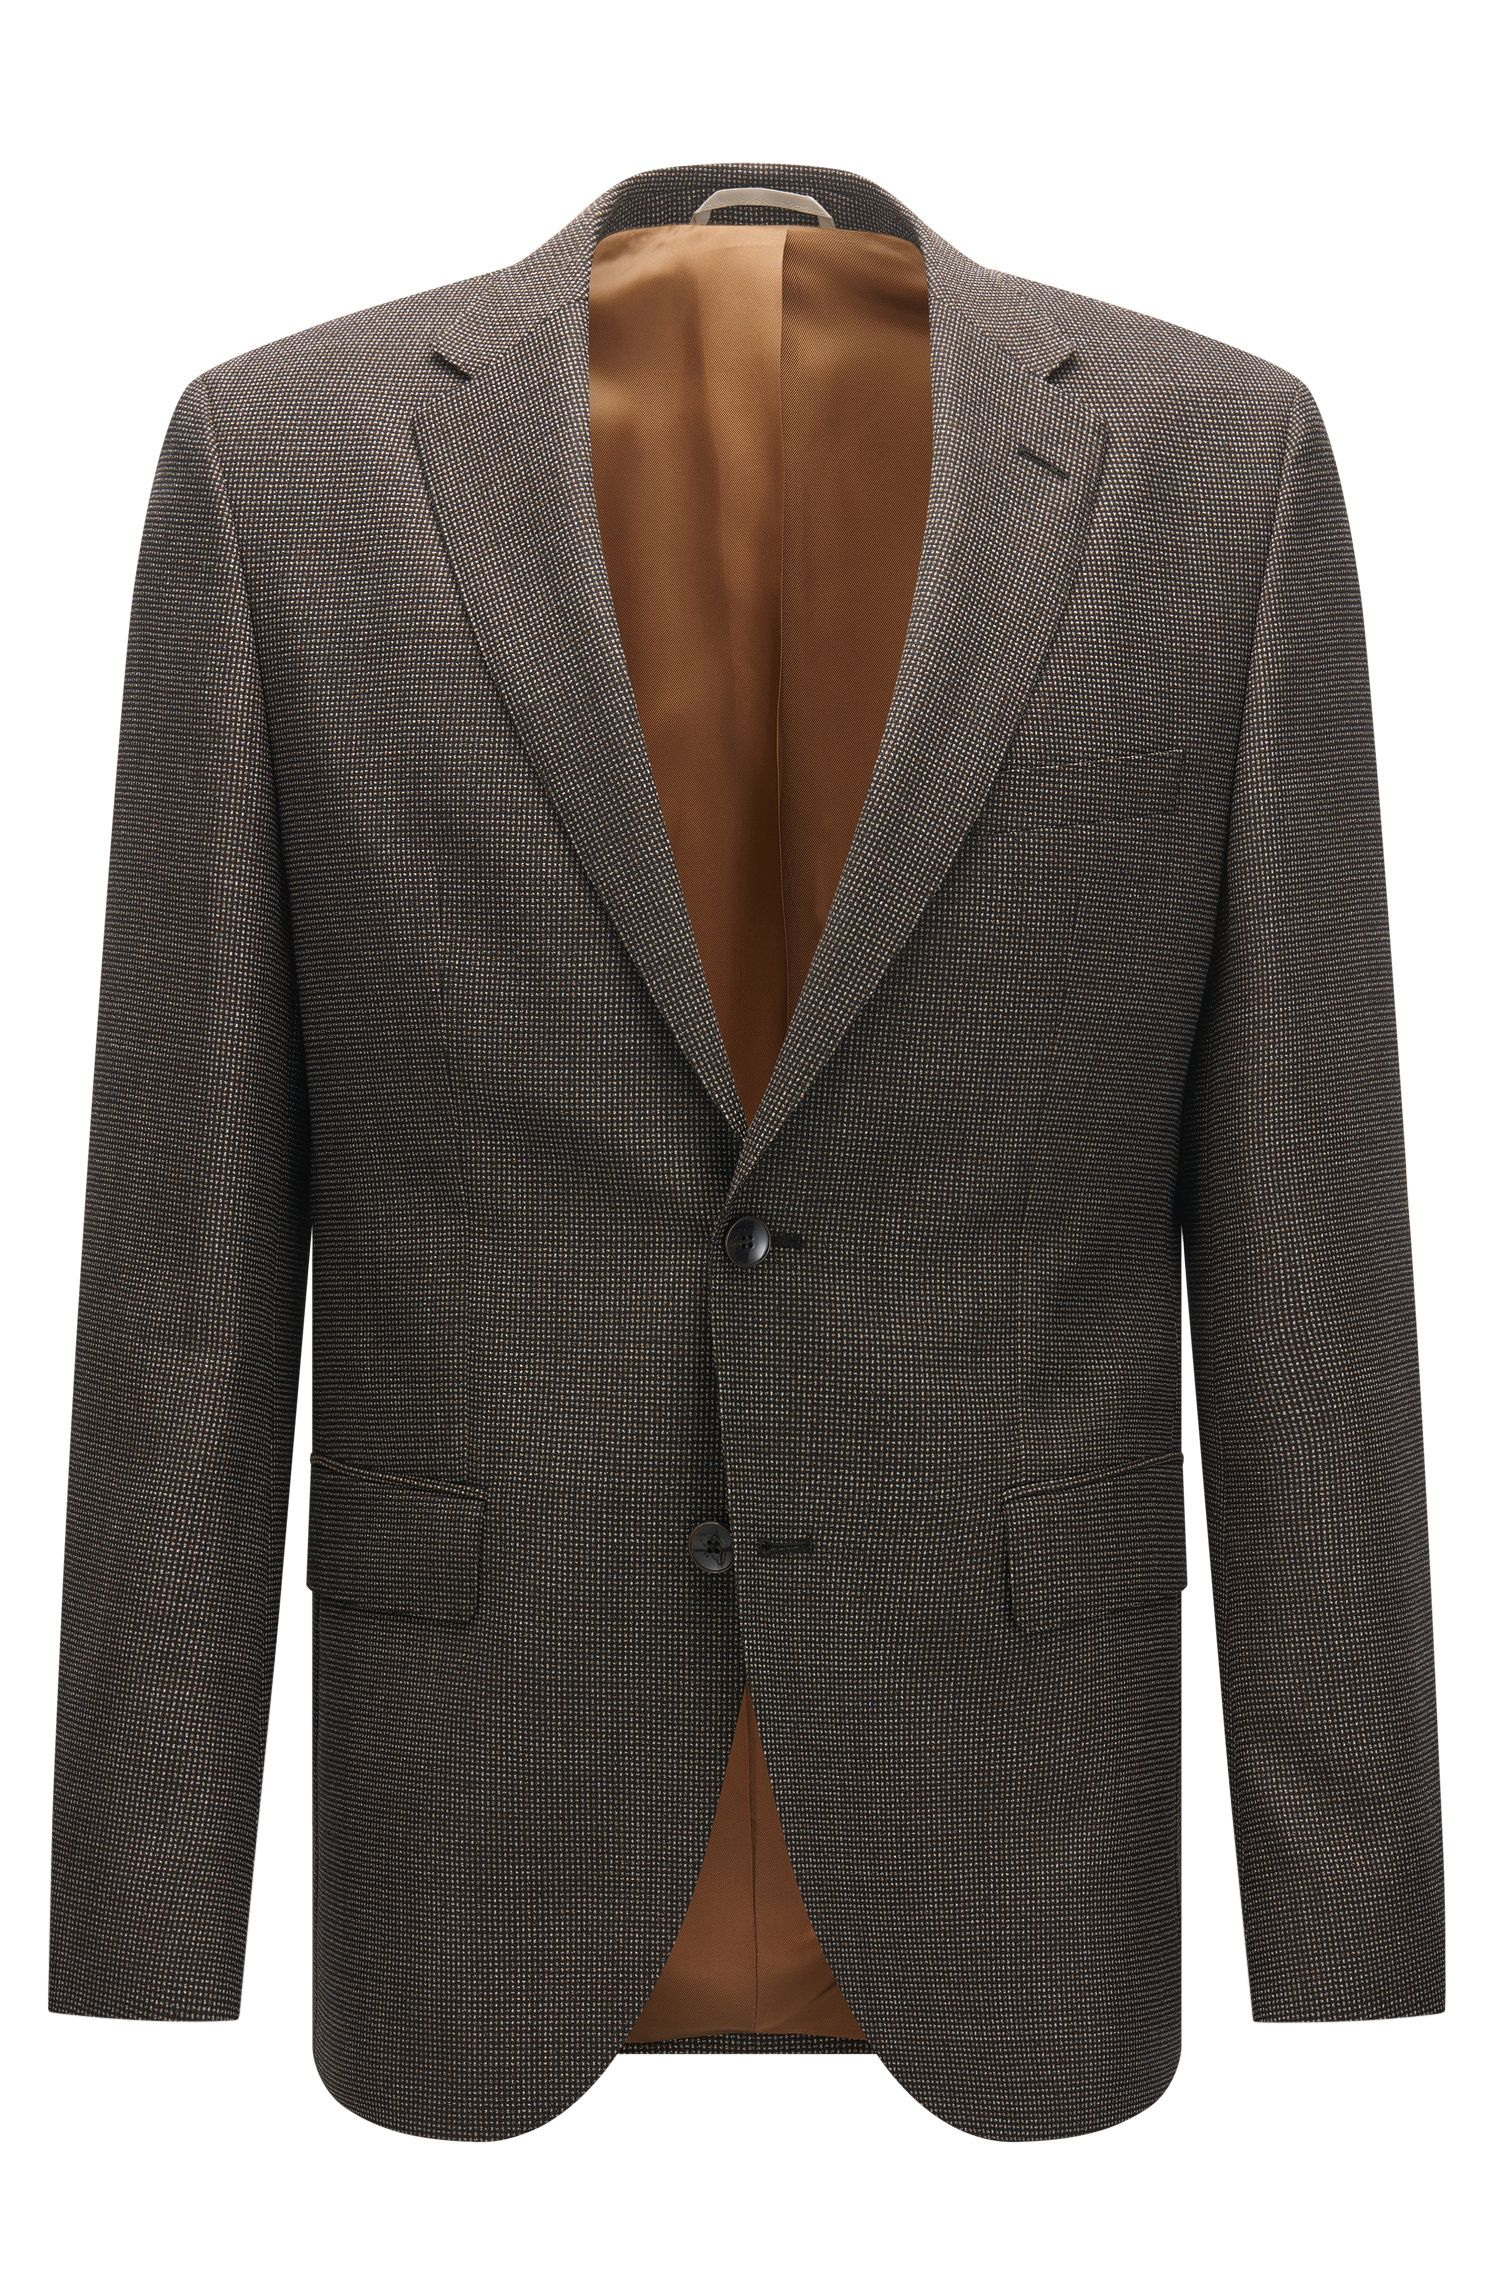 Regular-fit jacket in textured virgin wool